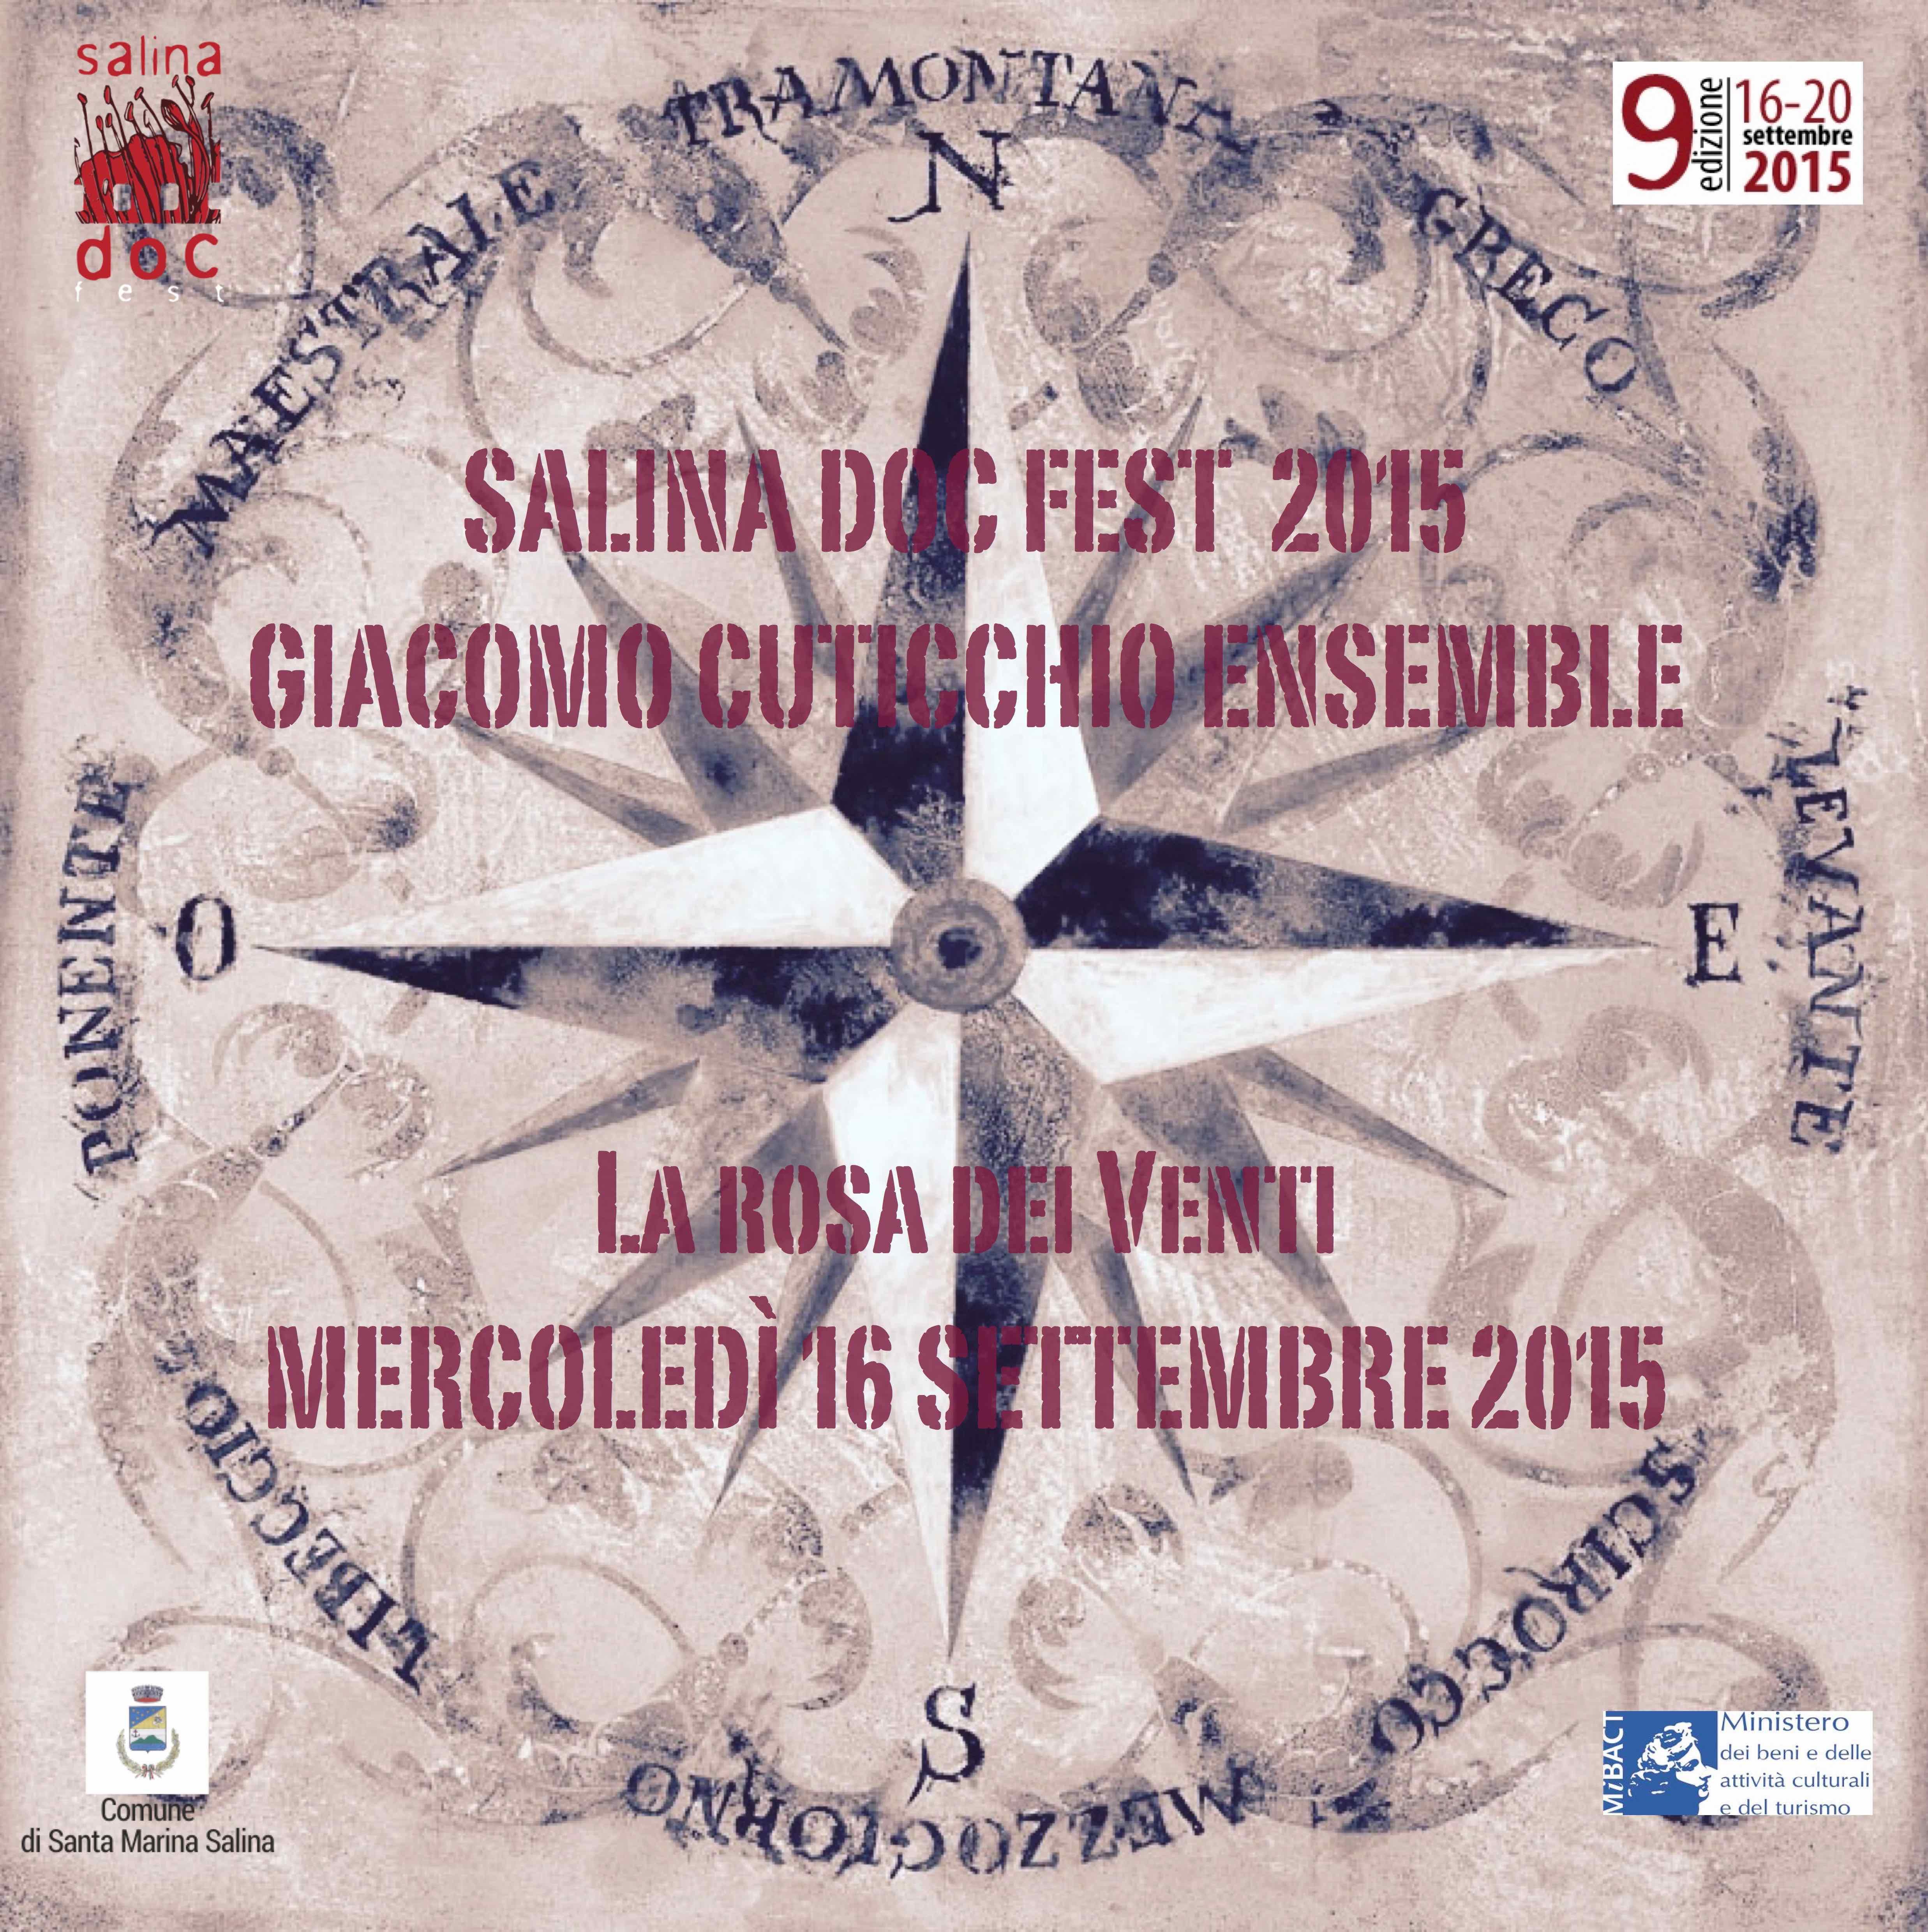 Salina doc Fest 2015 mini